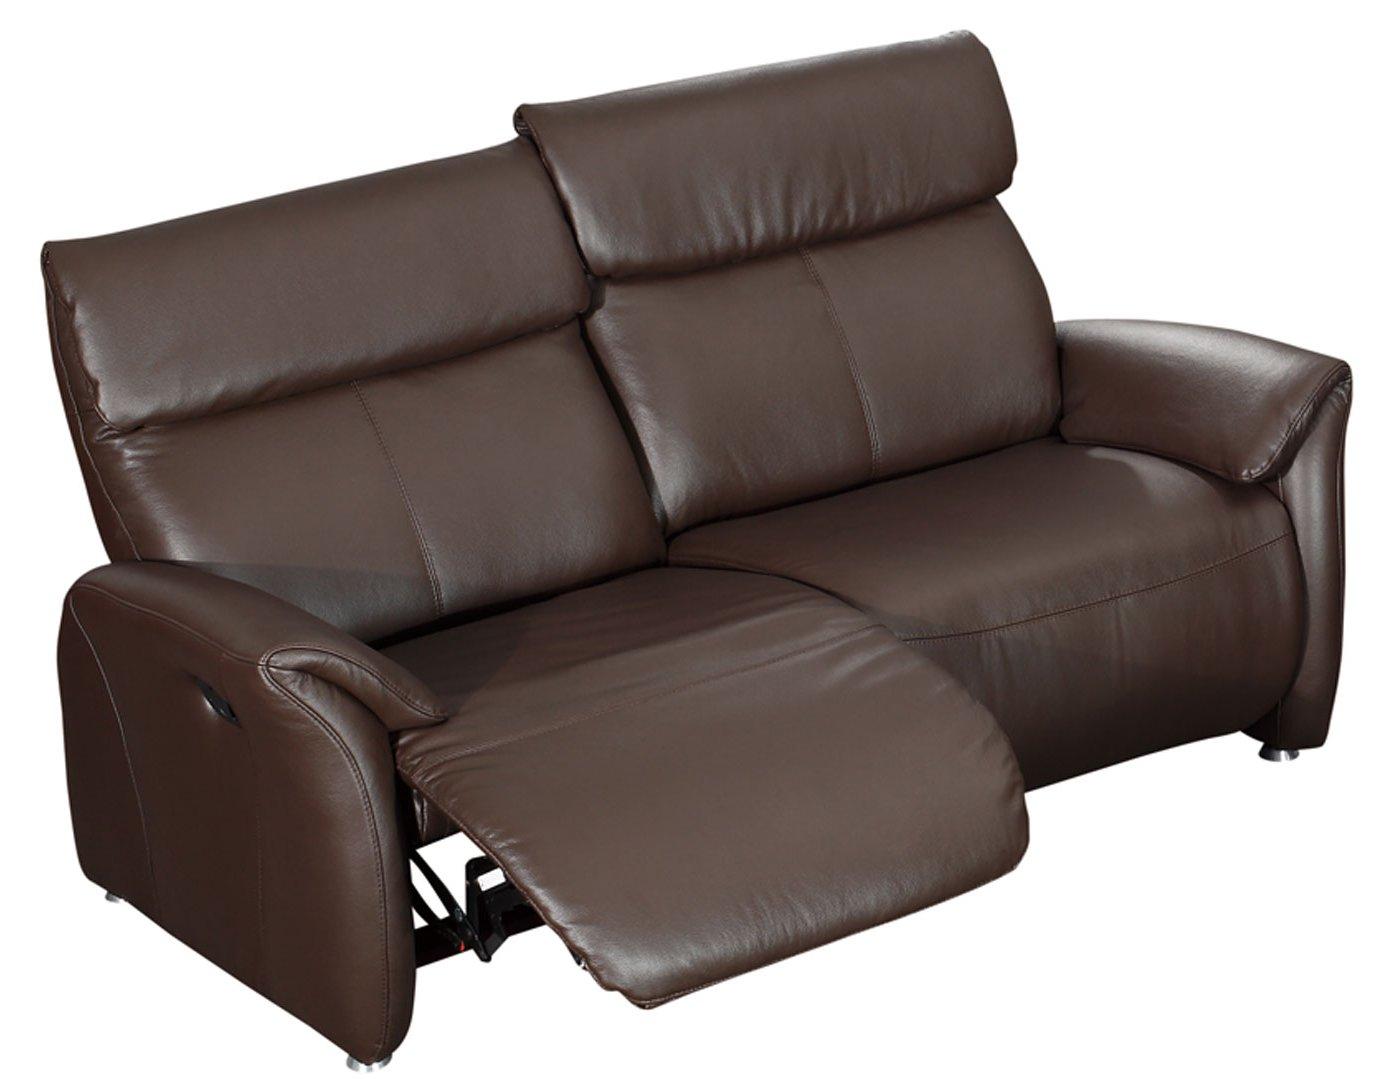 comment nettoyer canap en cuir. Black Bedroom Furniture Sets. Home Design Ideas